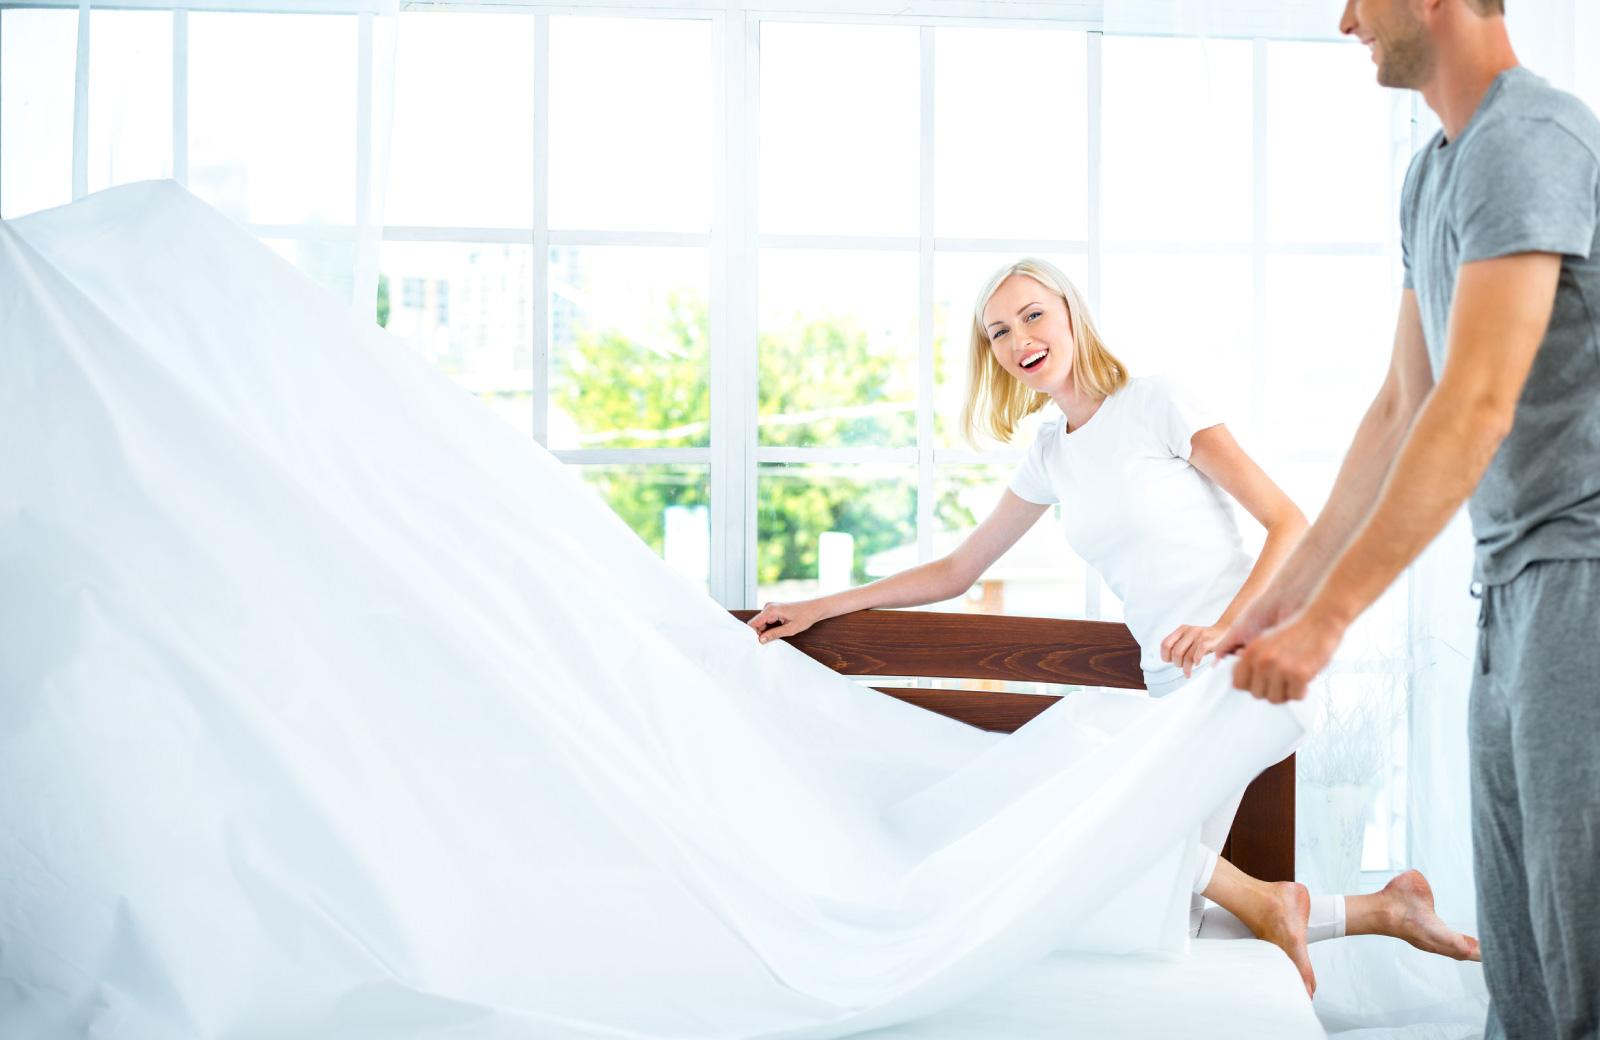 couple unfolding new linen